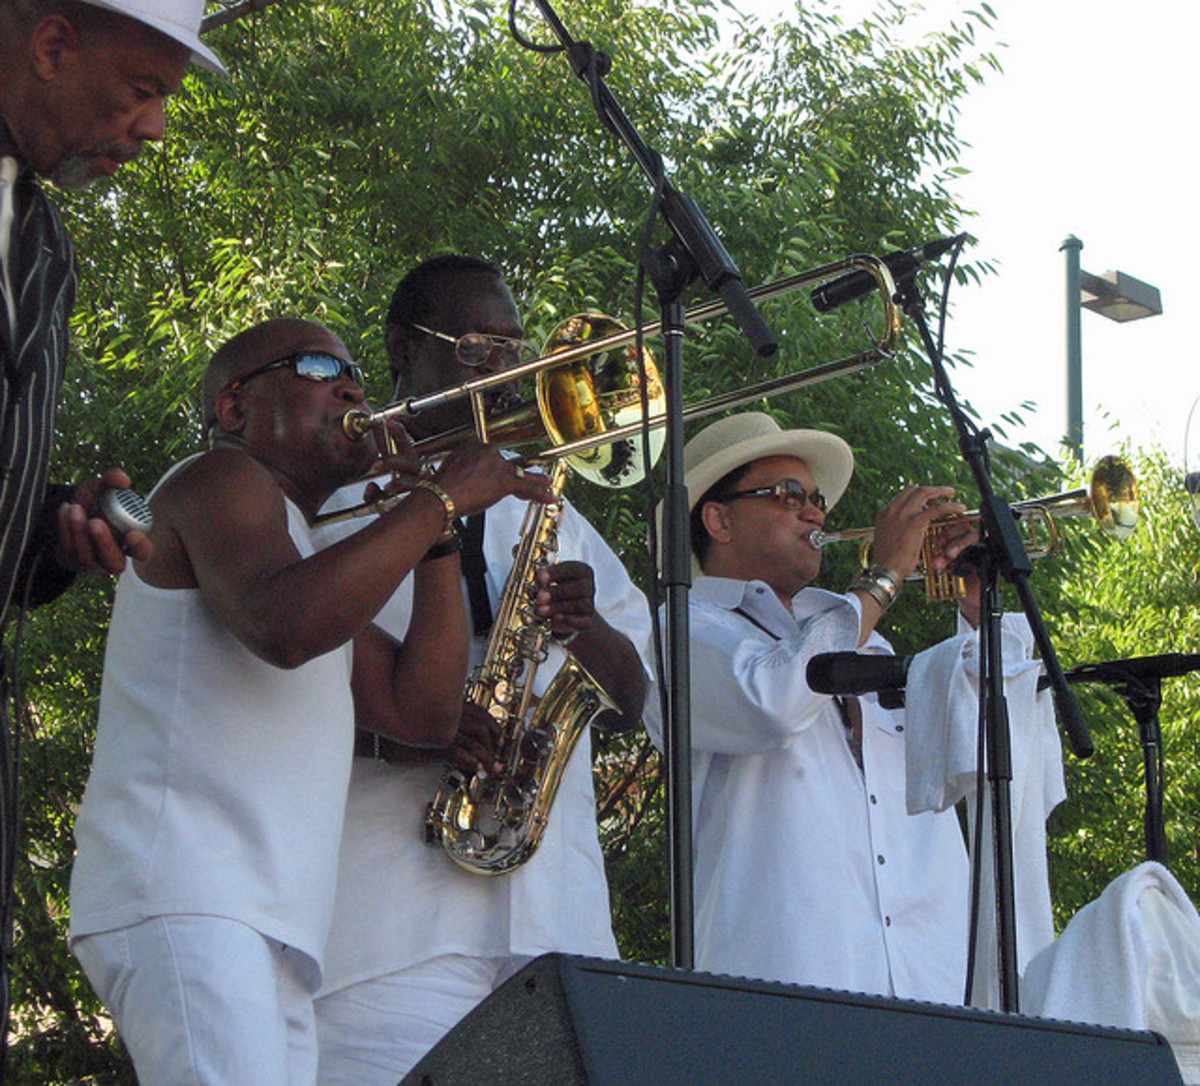 Bessie Smith Strut, Deacon Blues & Holy Smoke